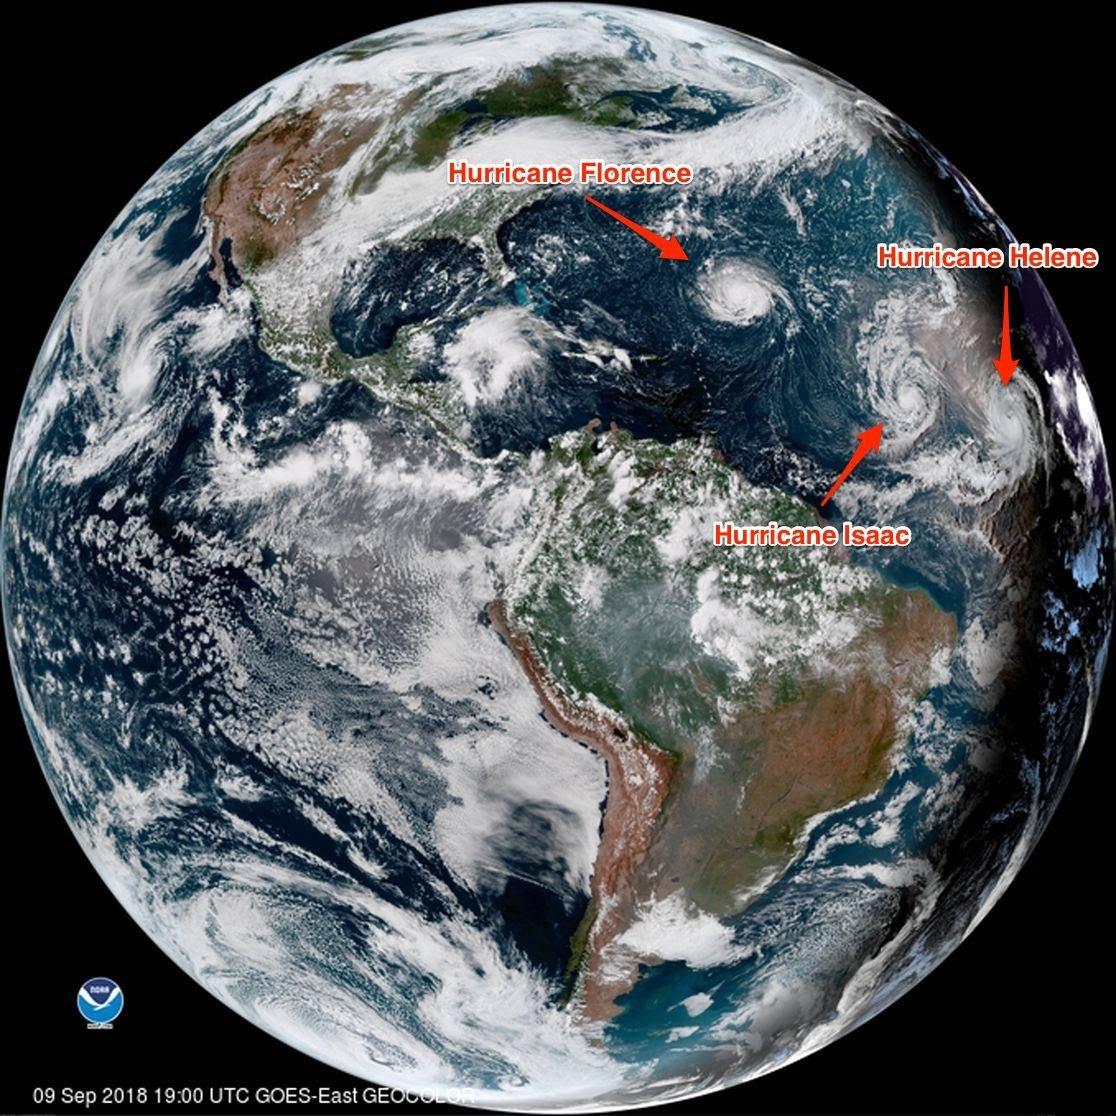 Hurricane Florence, Hurricane Isaac, and Hurricane Helene, NOAA